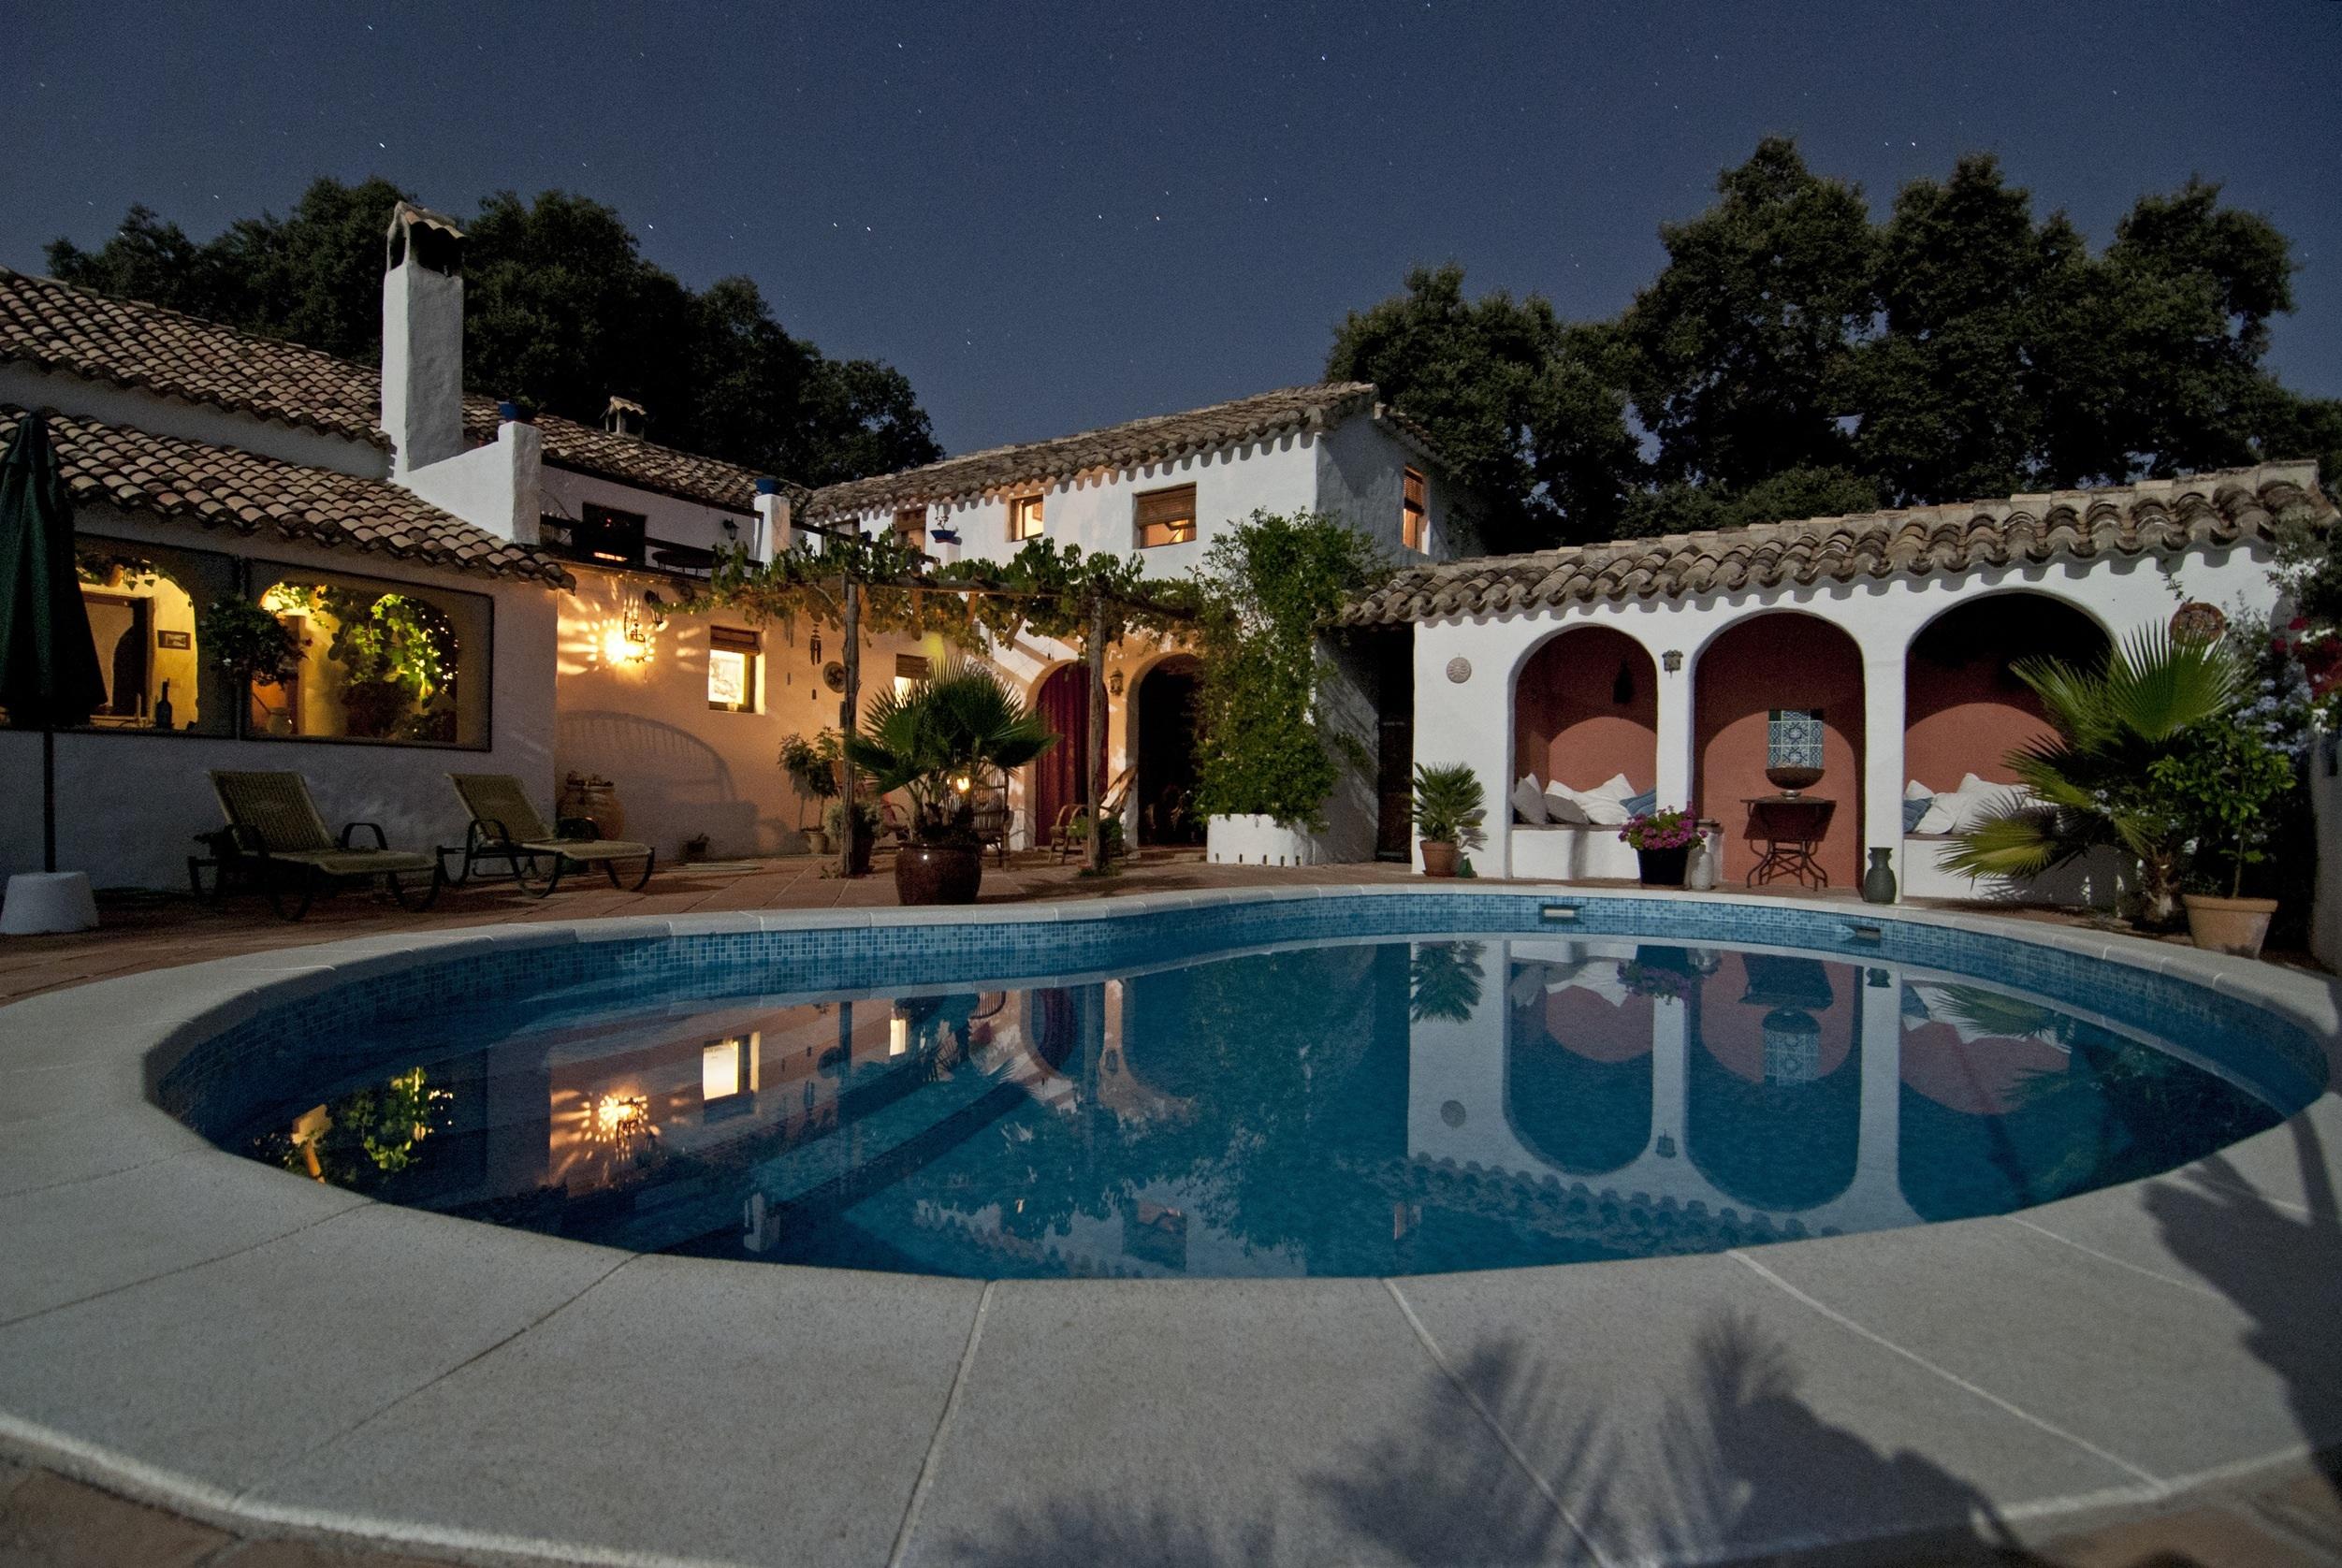 Night Villa Mansion House Roof Palace Pool Swimming Plaza Backyard Property Leisure Chairs Resort Stars